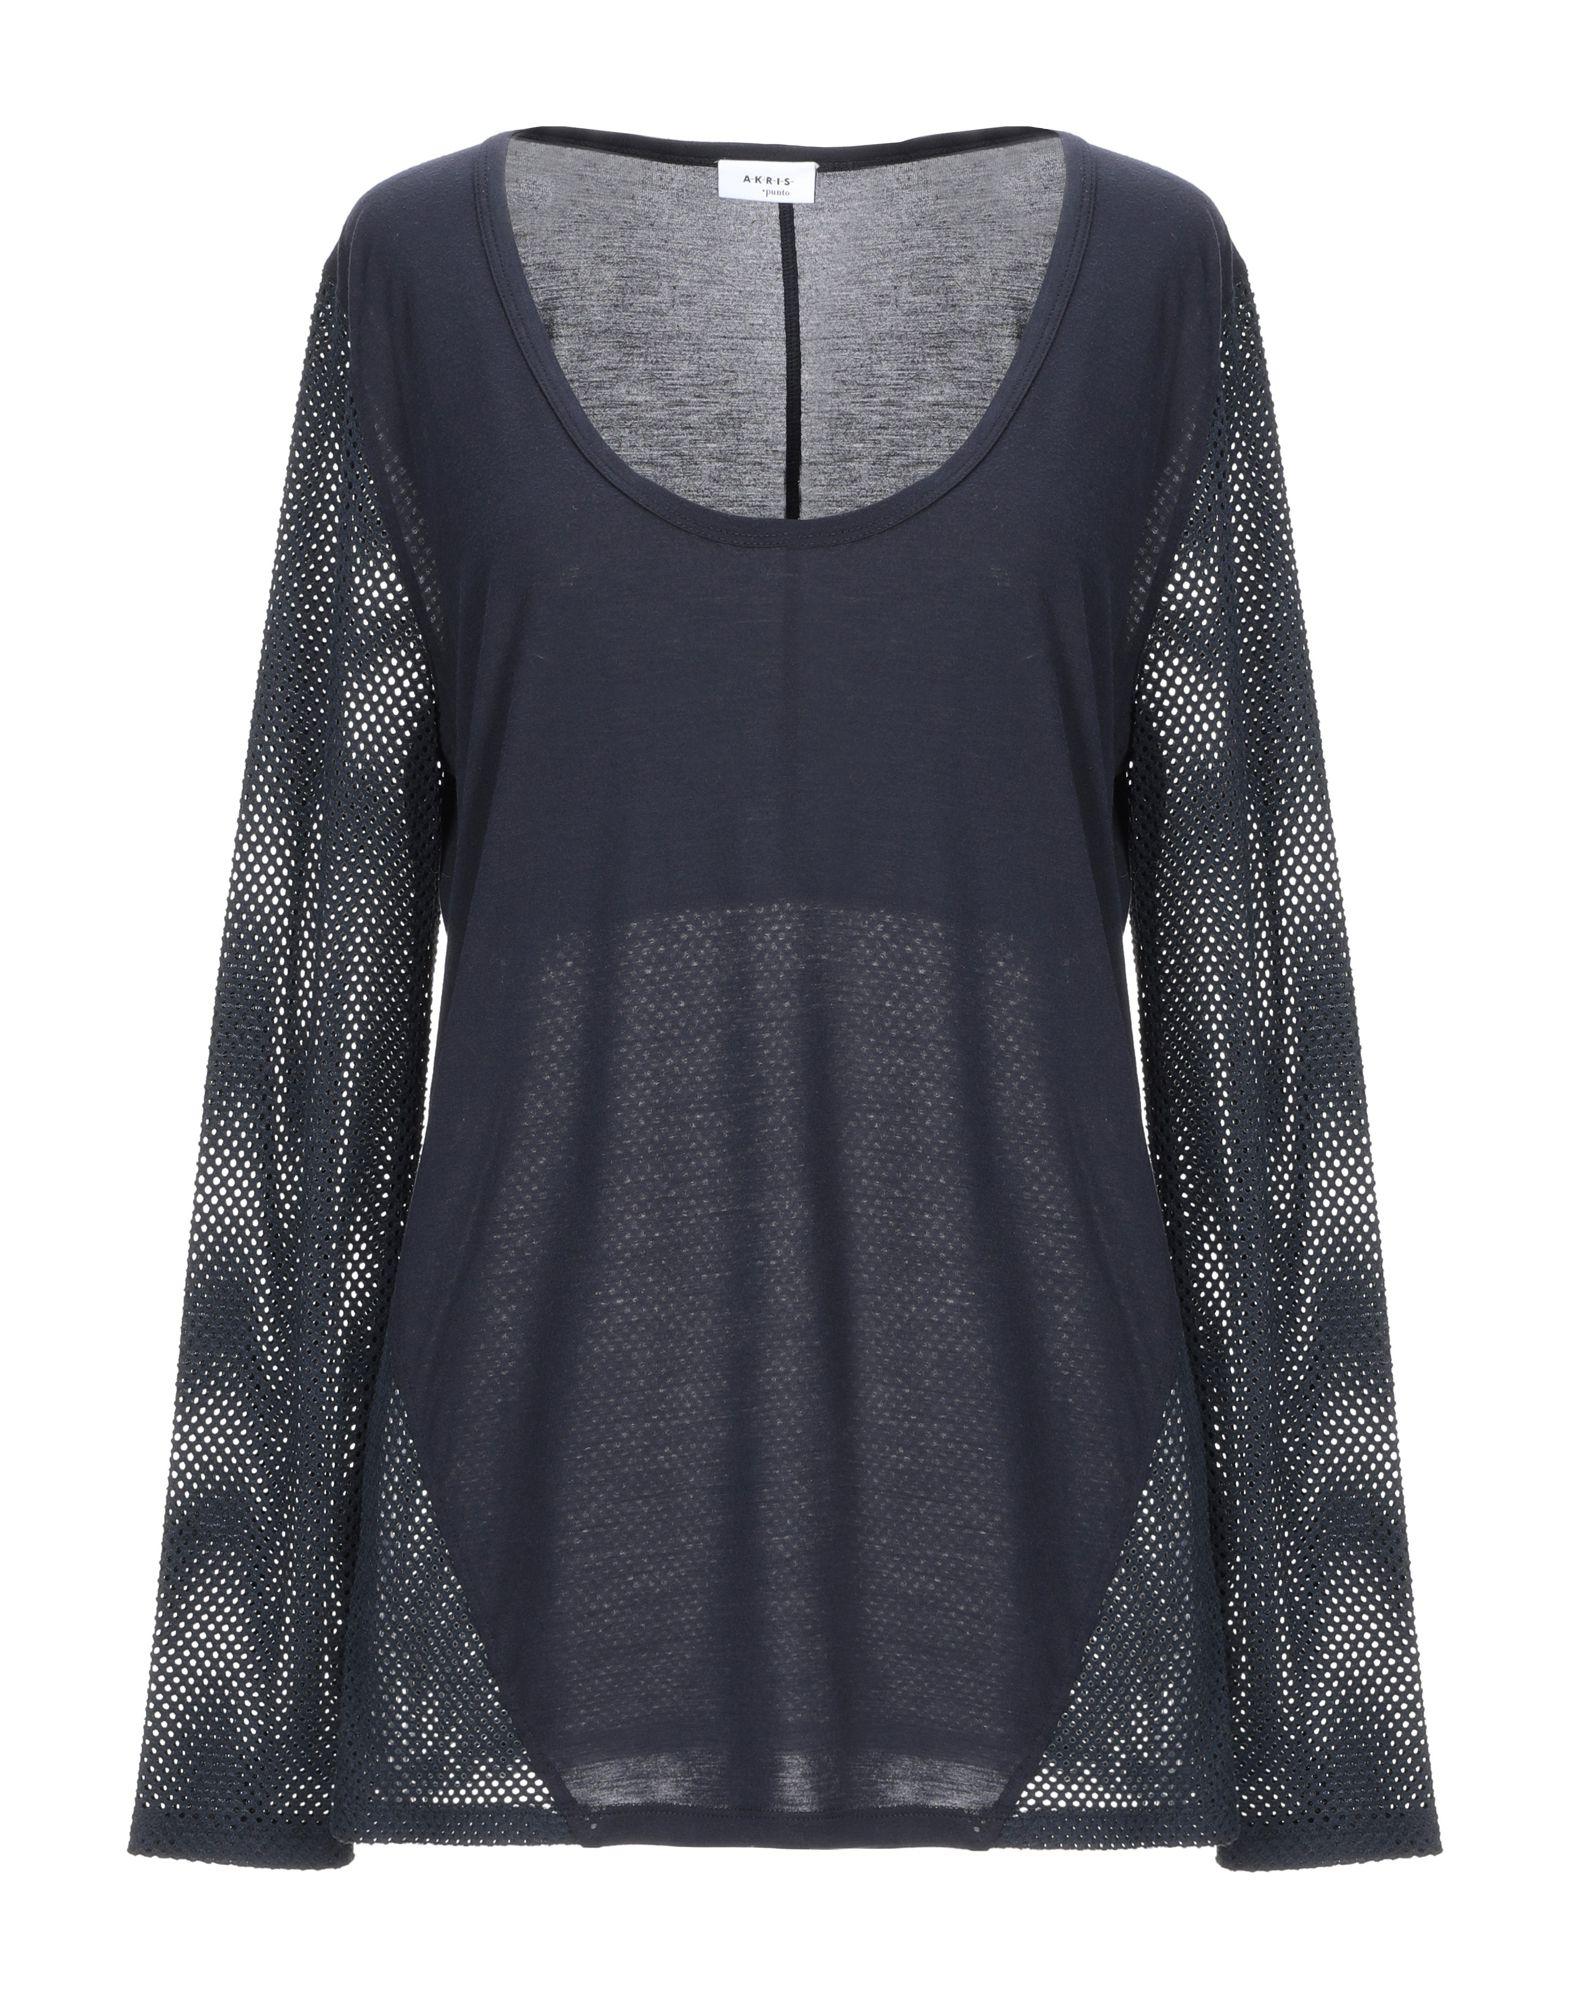 AKRIS PUNTO T-shirts. jersey, no appliqués, basic solid color, round collar, long sleeves, no pockets, small sized. 85% Viscose, 15% Silk, Flax, Elastane